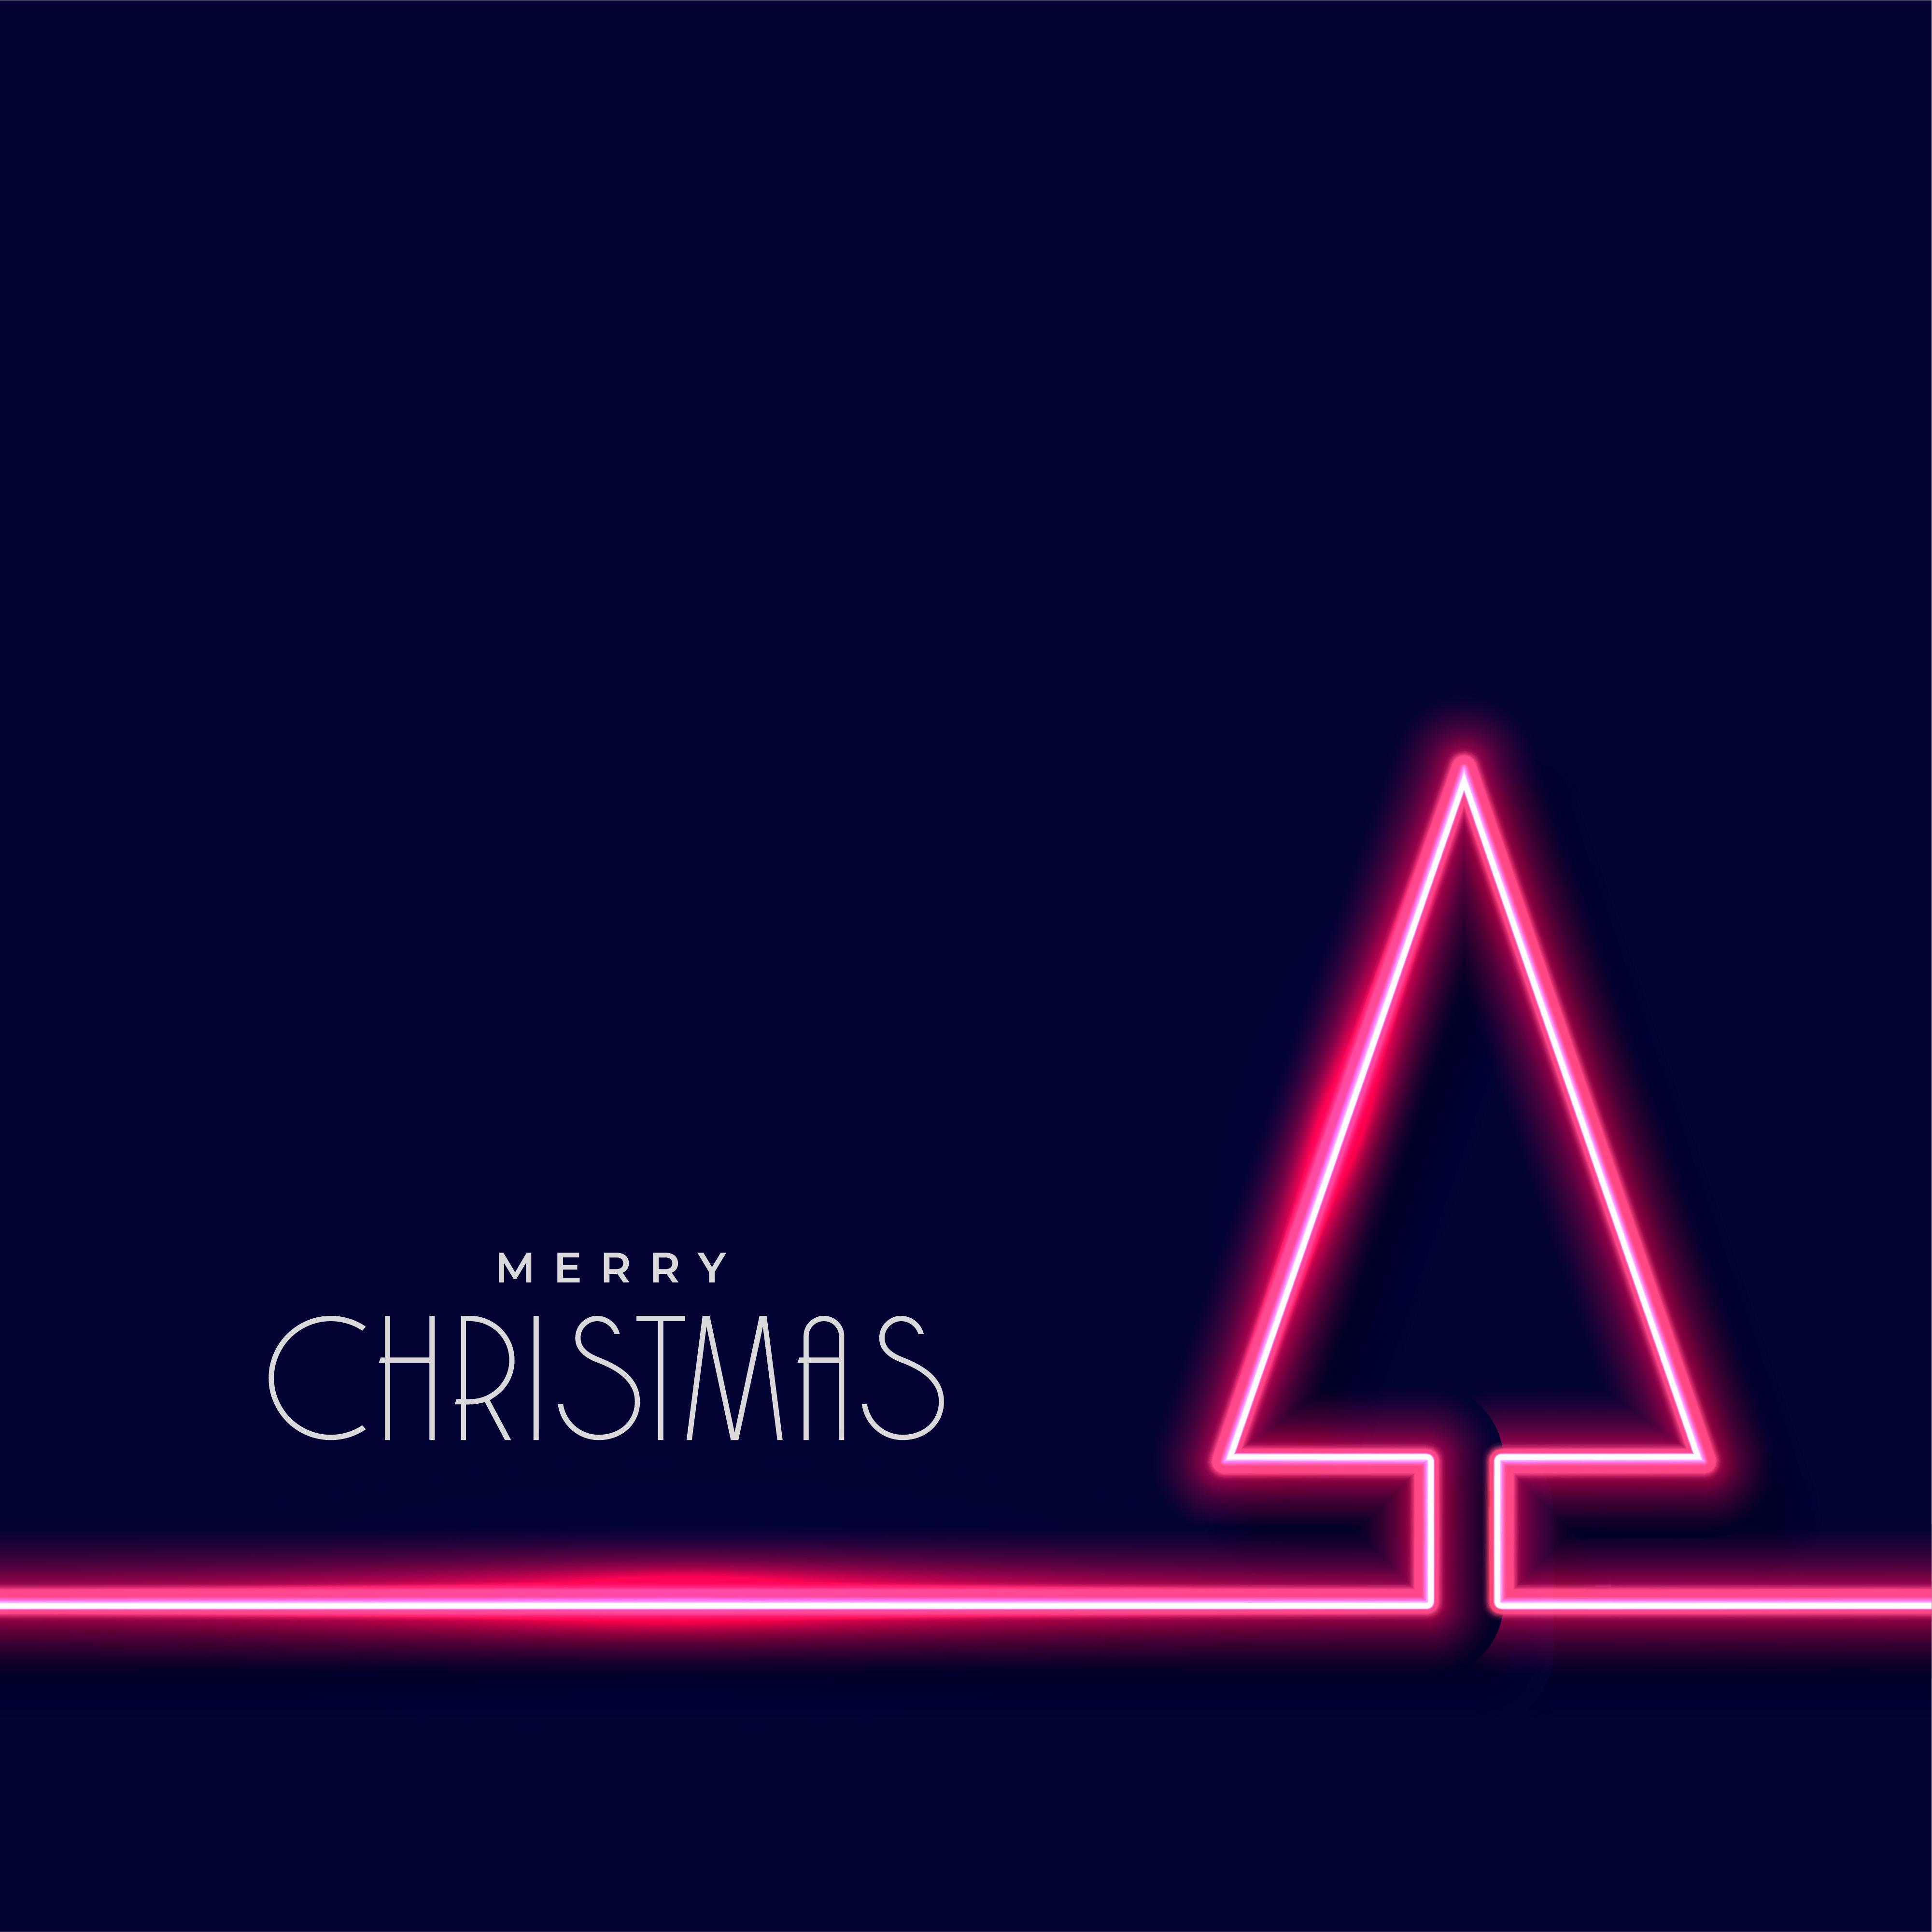 neon christmas tree on dark blue background - Download ...